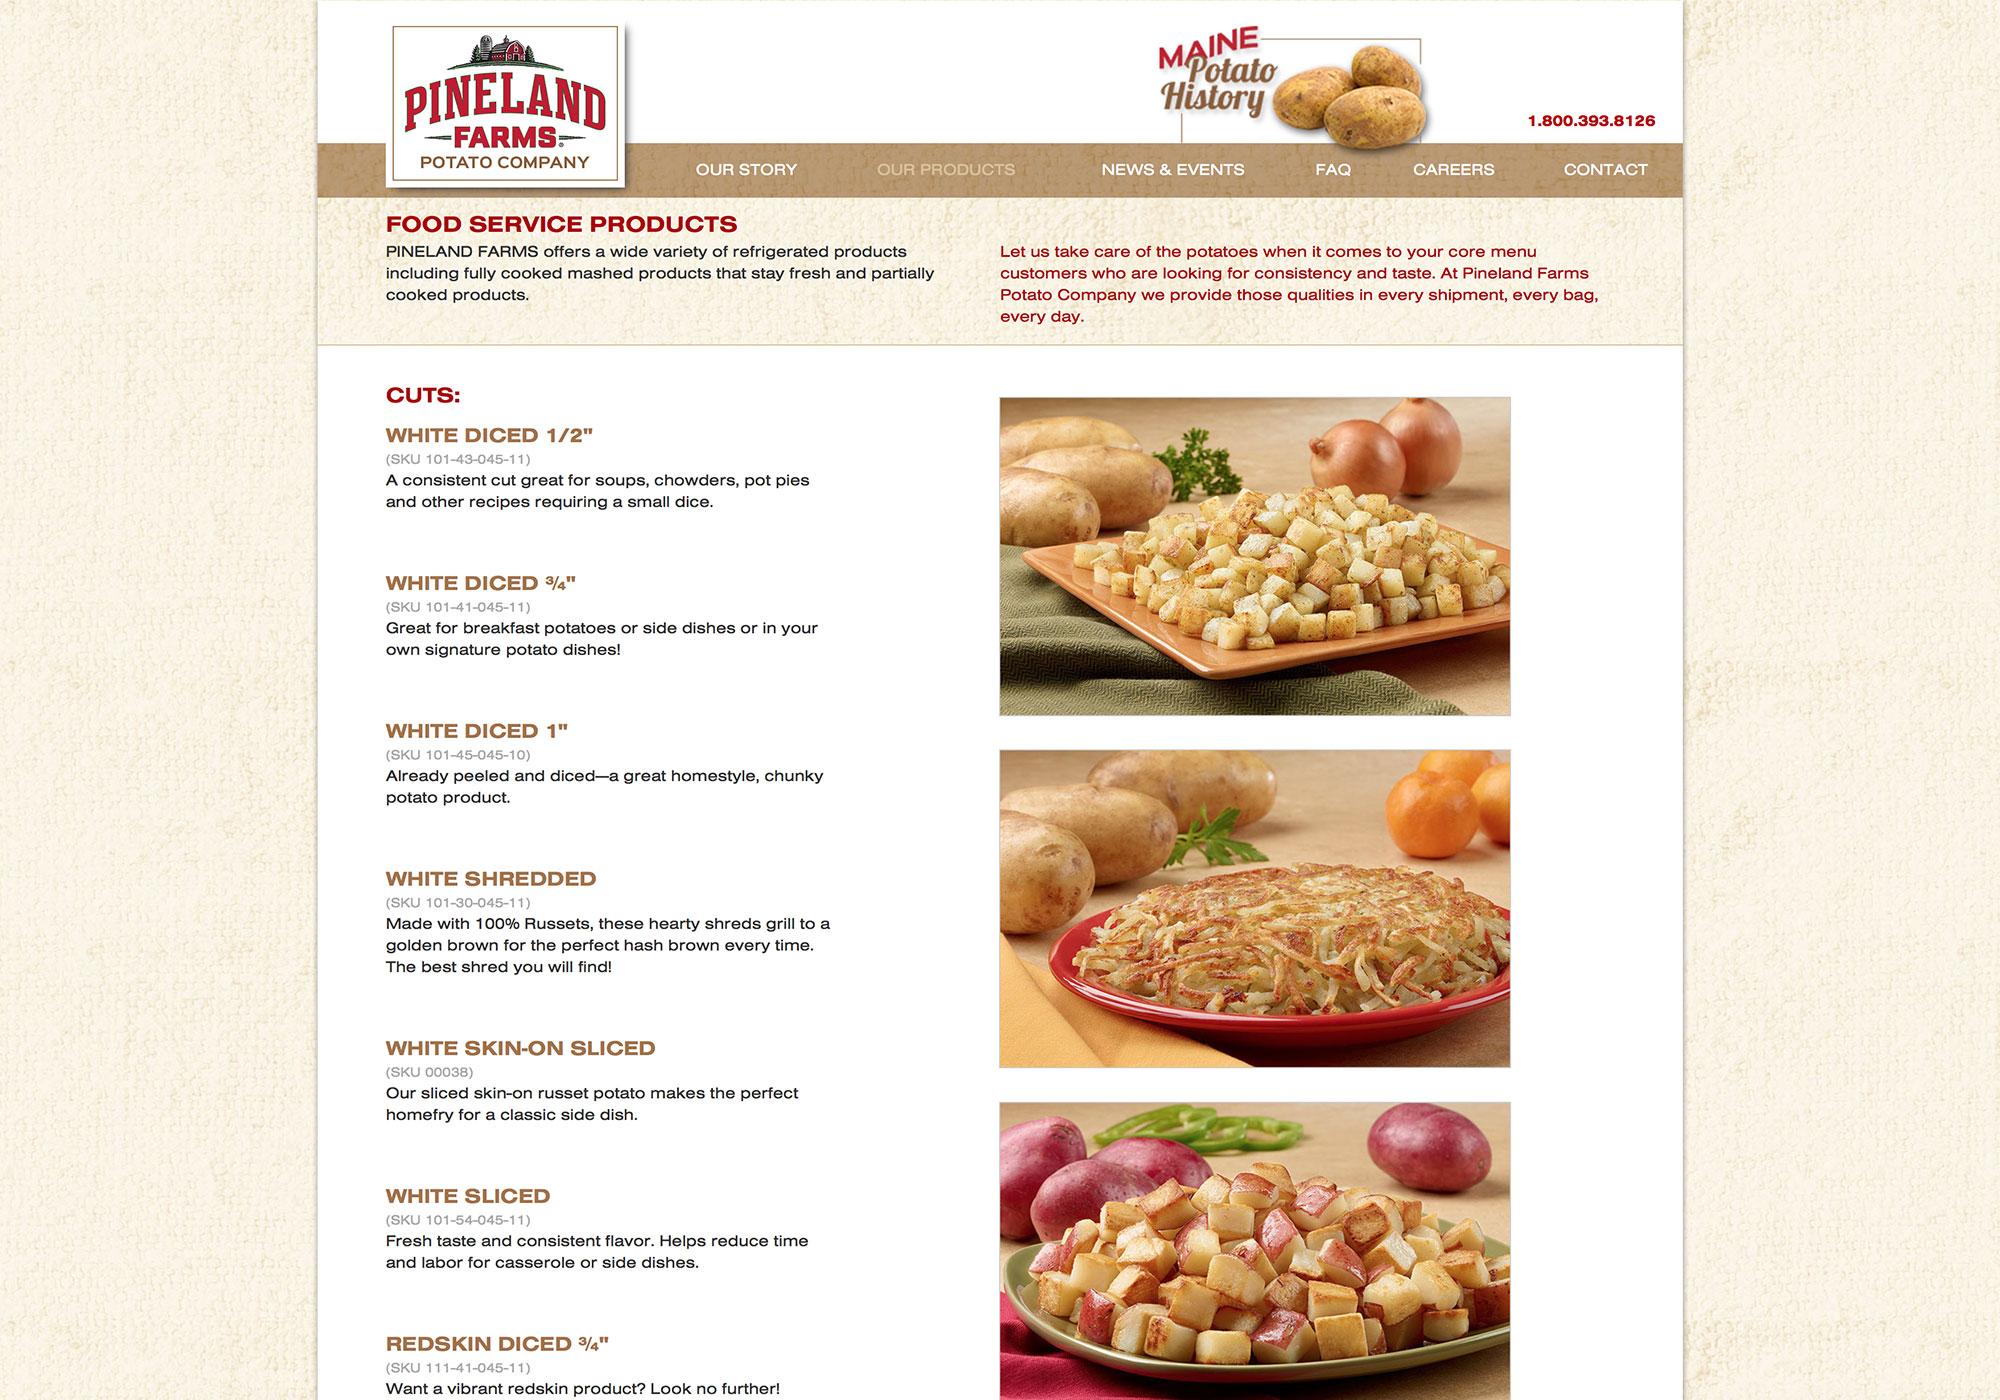 Maine web design company, SlickFish Studios, designed the new Pineland Farms Potato Company website.